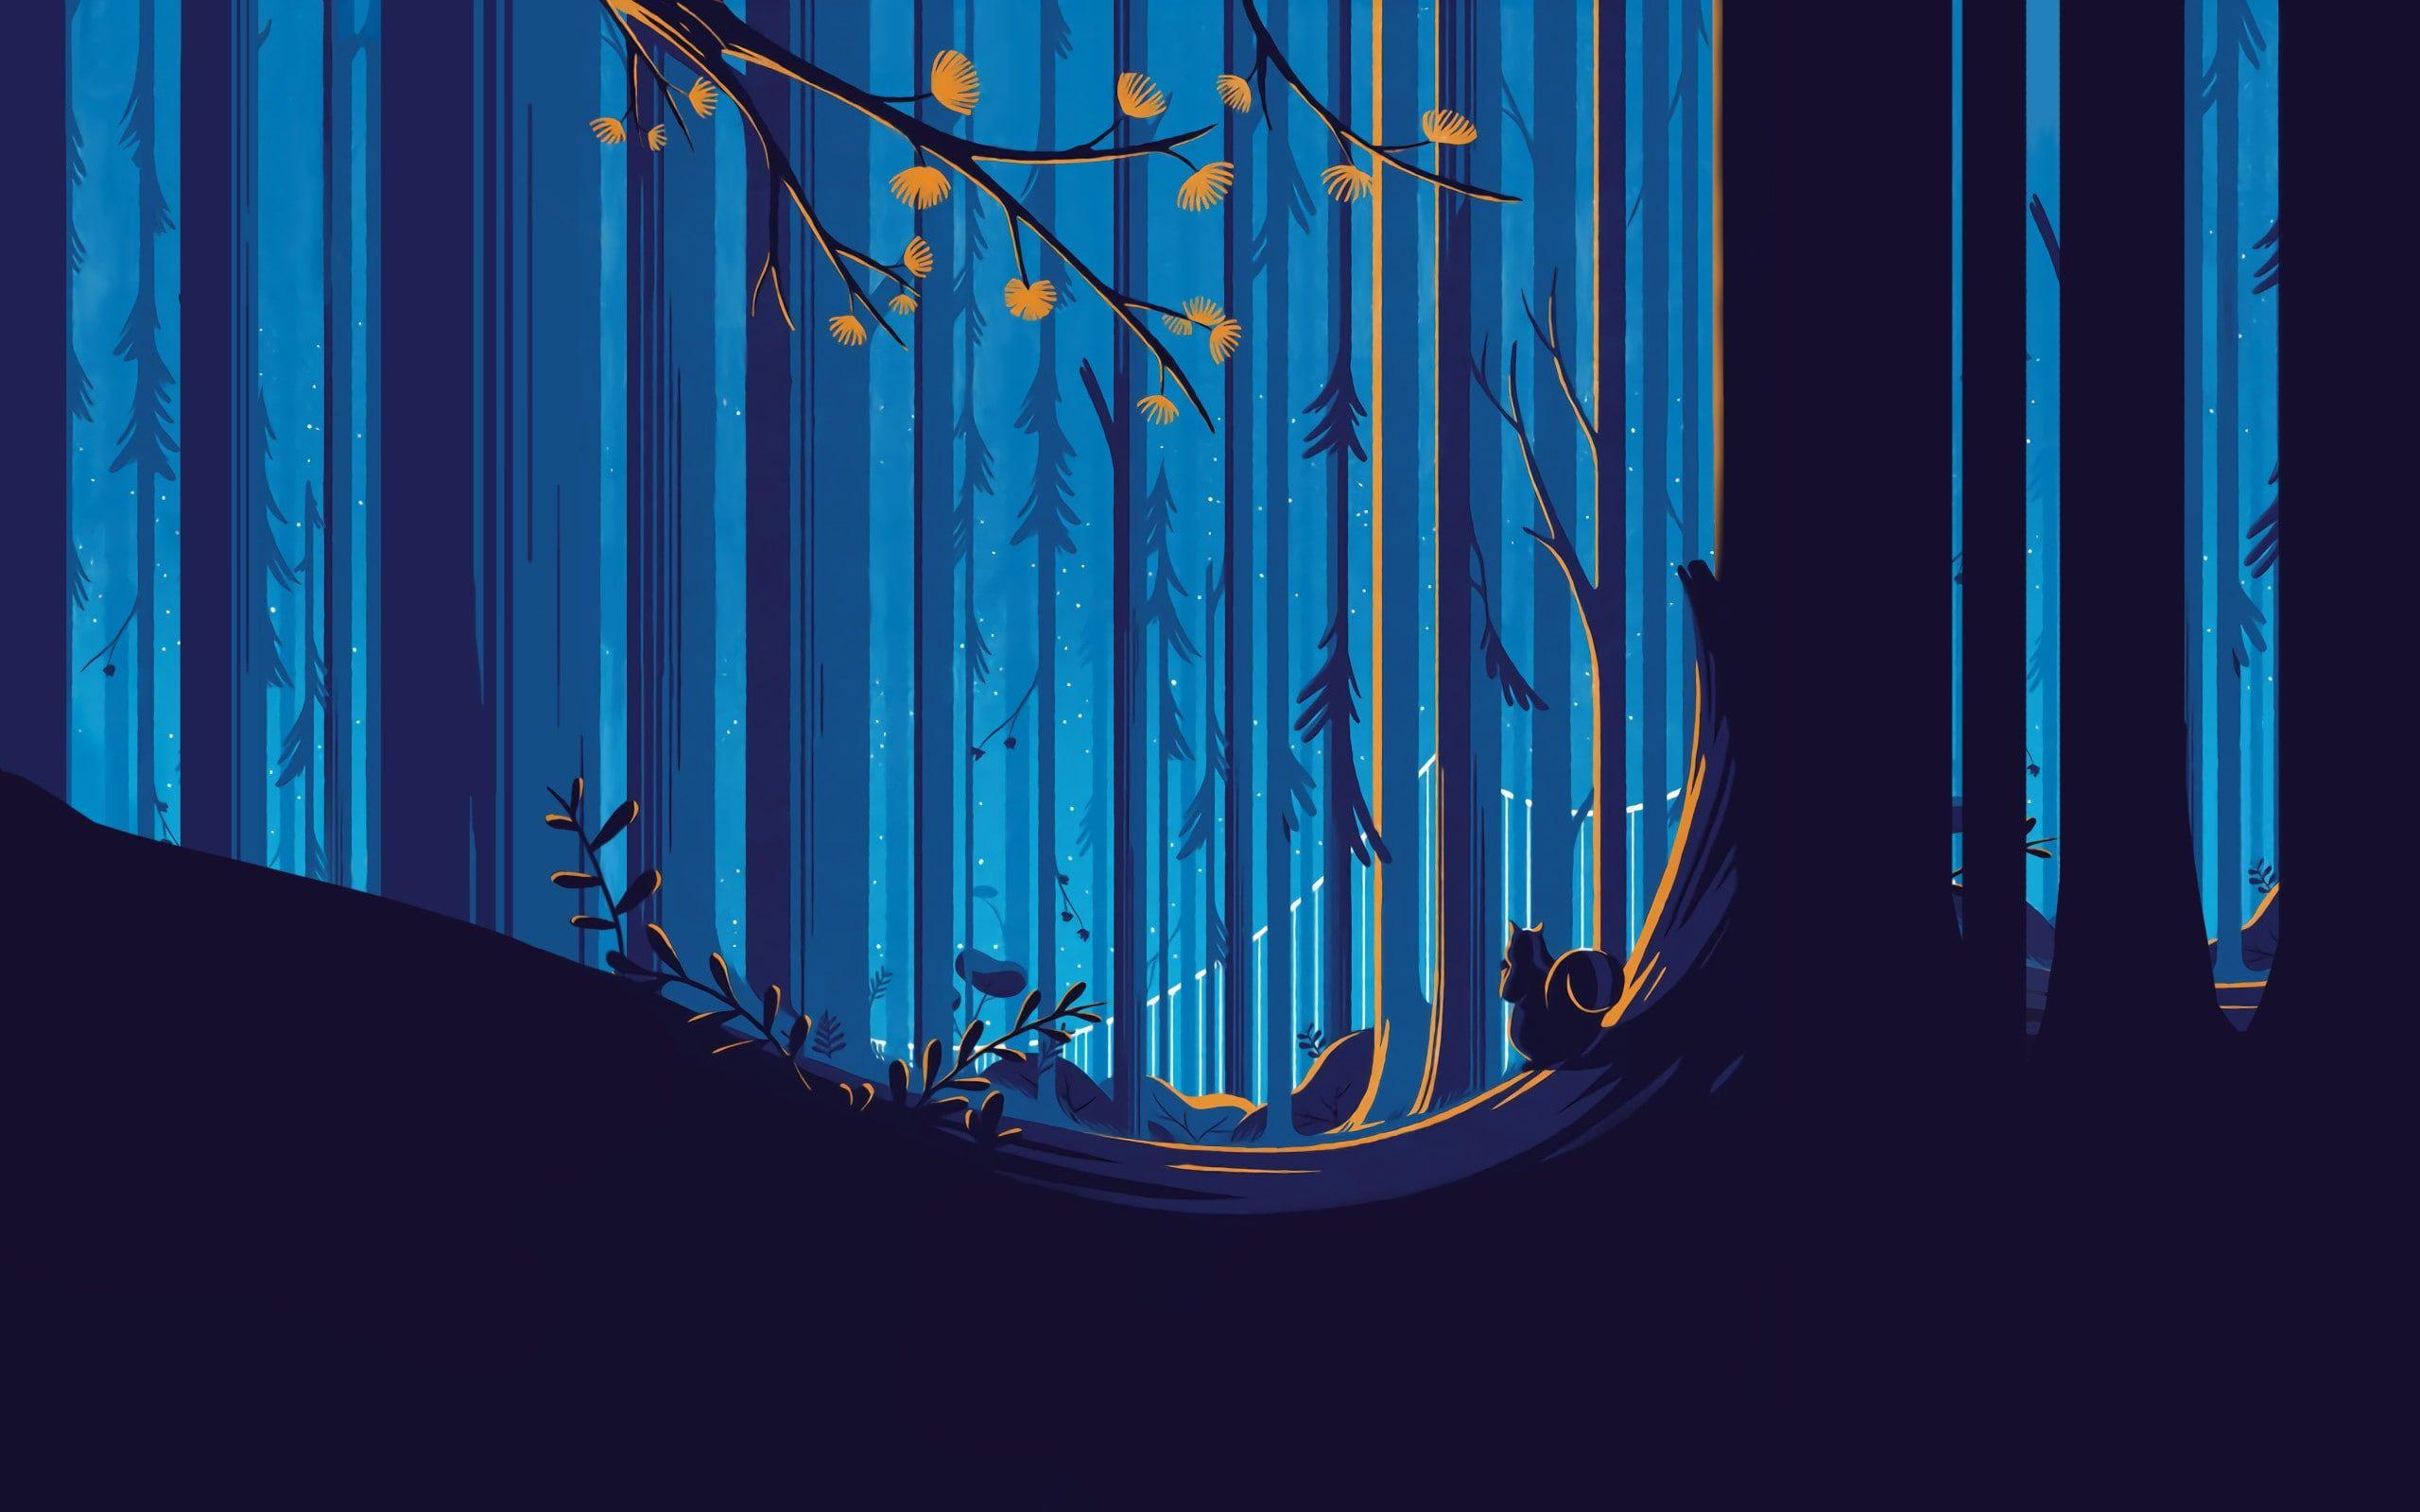 forest illustration Sky blue squirrel Tom Haugomat Trees yellow 2560x1600